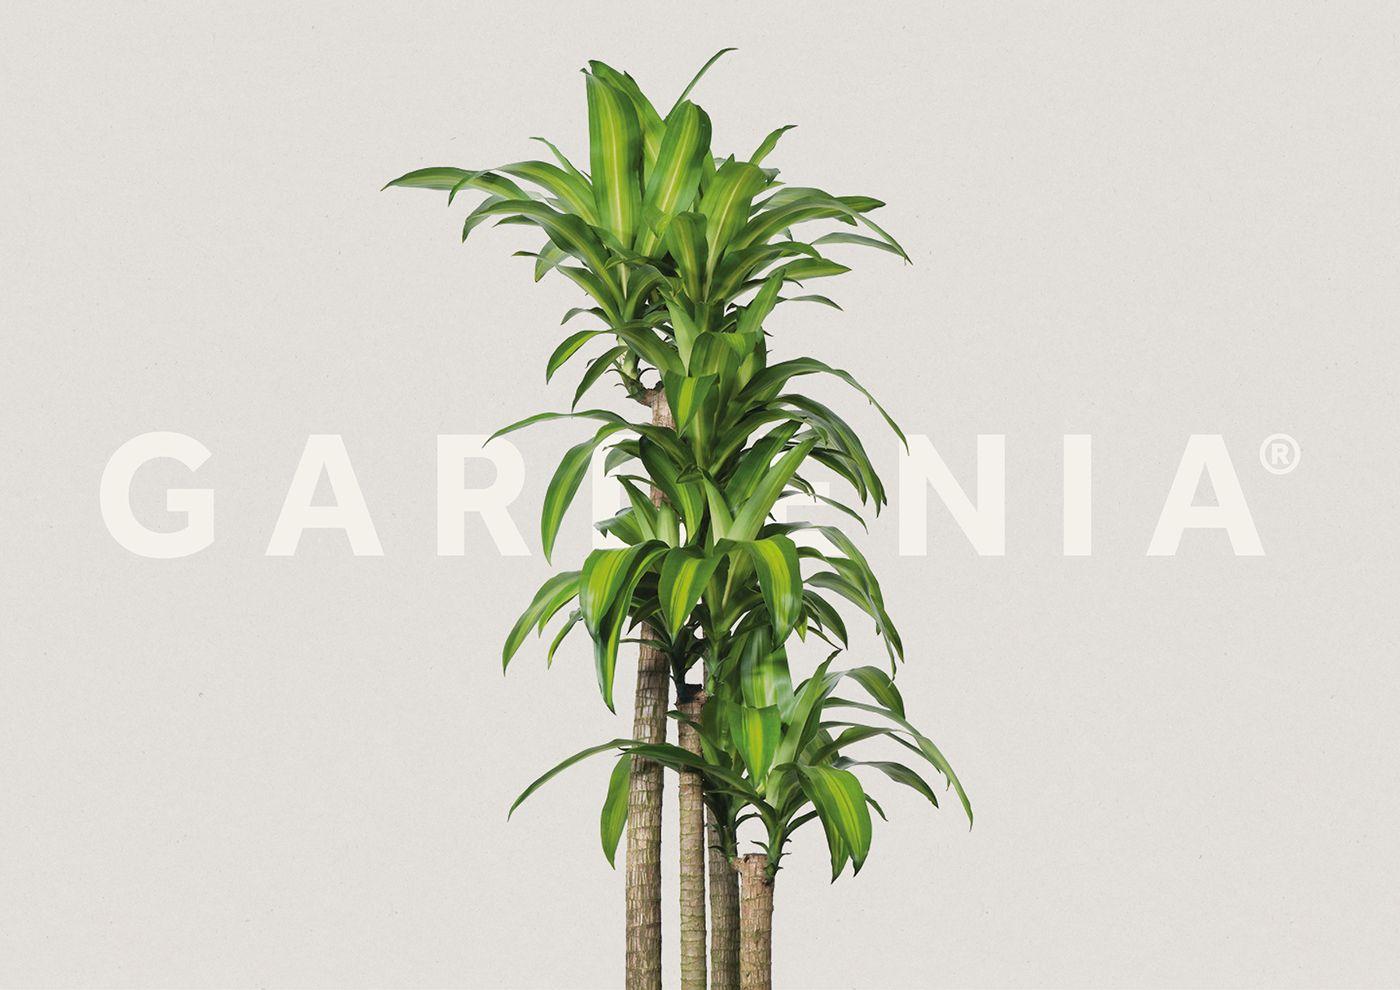 inspiring gardenia house plant. Gardenia on Behance  Arabic logos Pinterest Gardenias